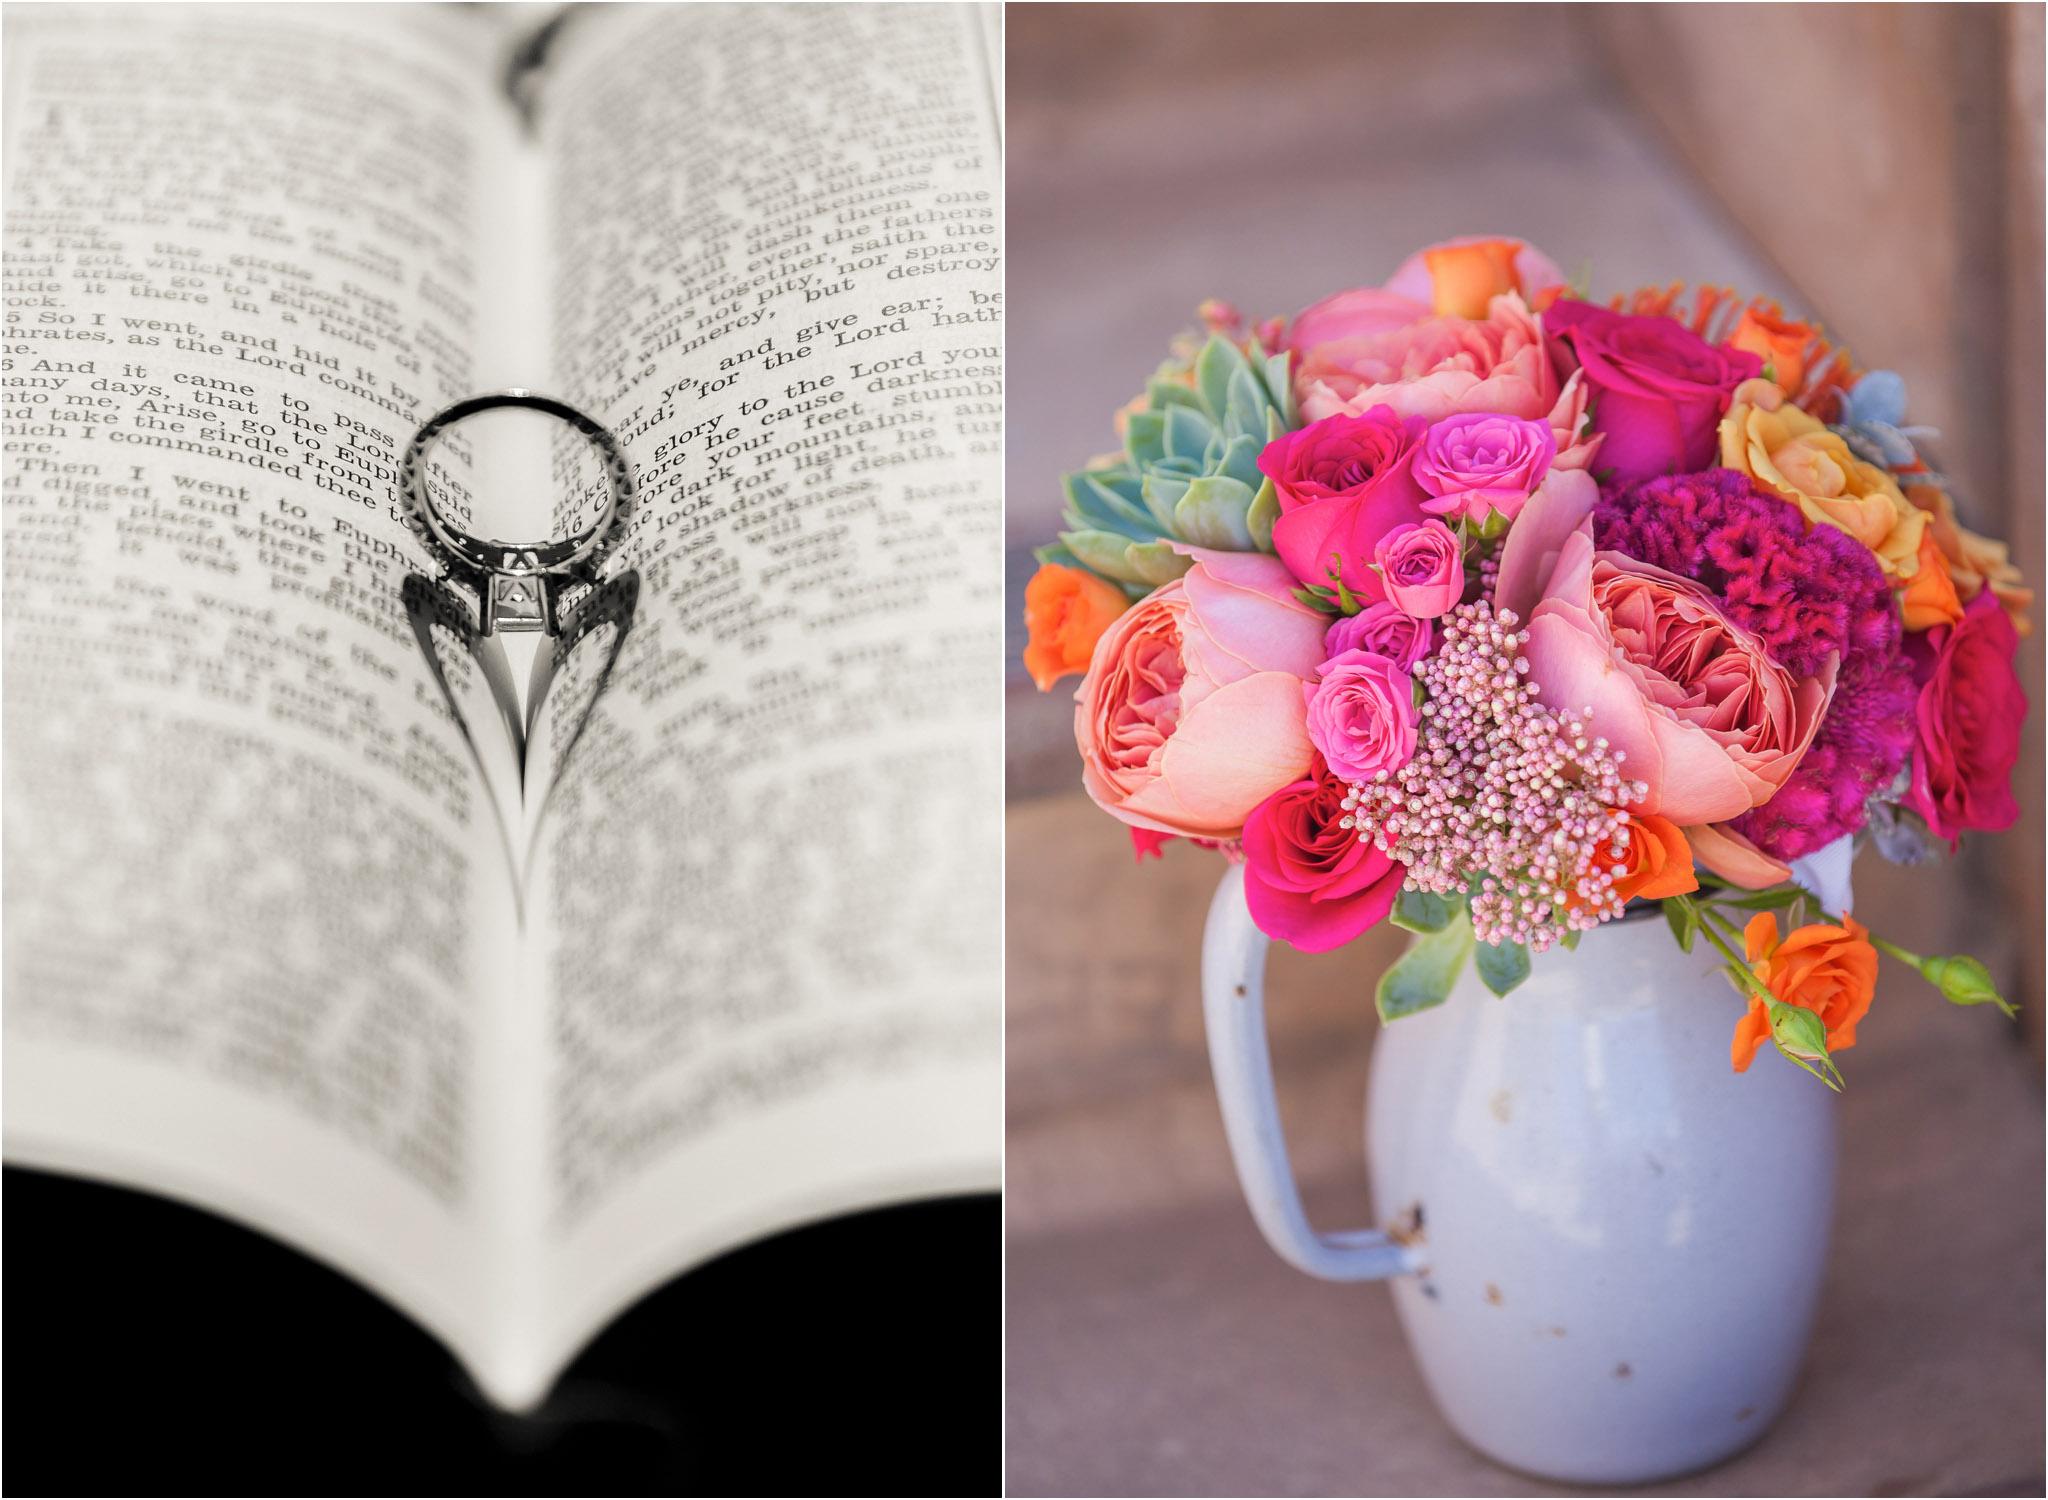 San Diego Wedding Photography Bible Wedding Ring Heart Pretty Pink